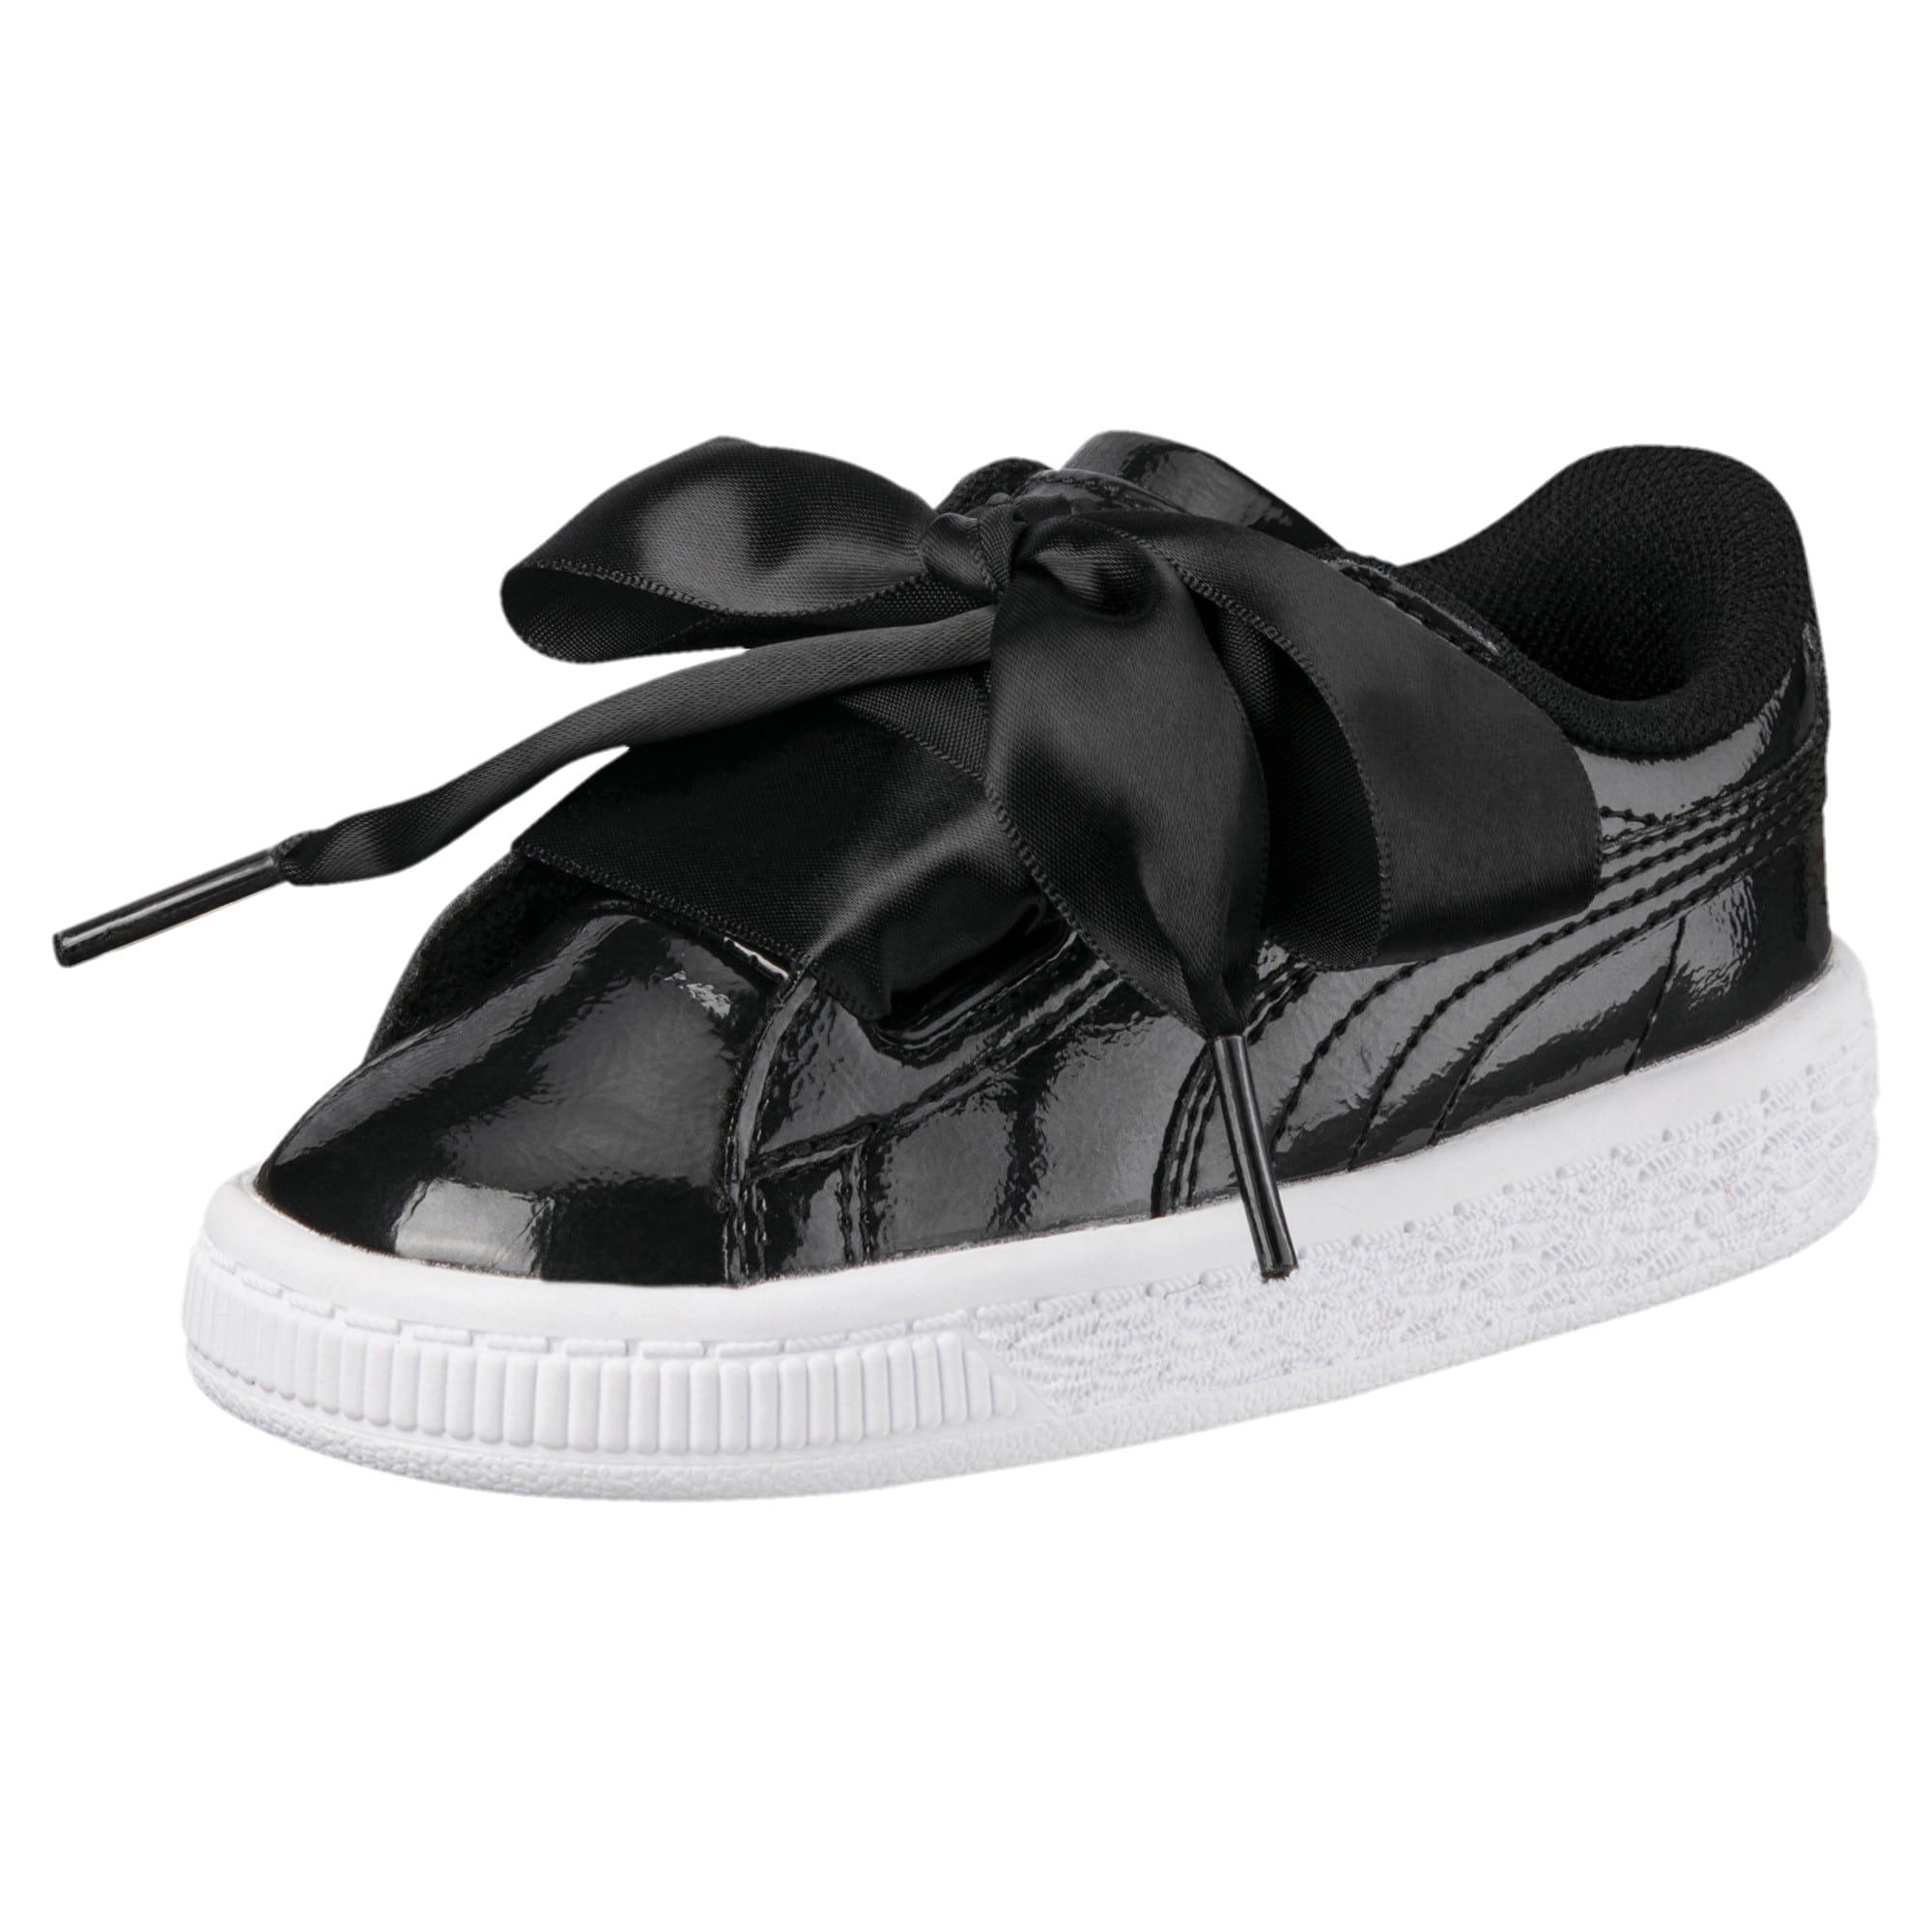 Thumbnail 1 of Basket Heart Glam Little Kids' Shoes, Puma Black-Puma Black, medium